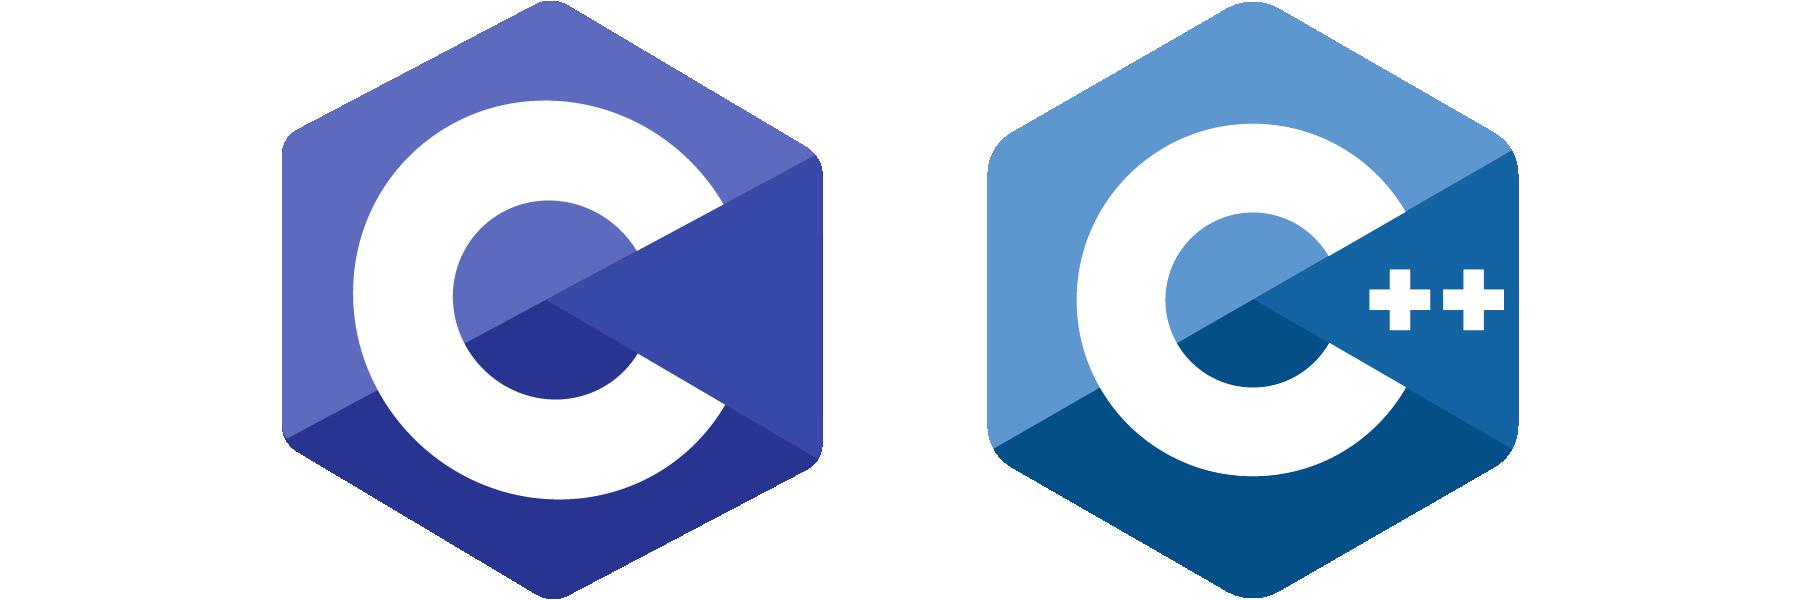 Technology-Logos-C-C++@2x